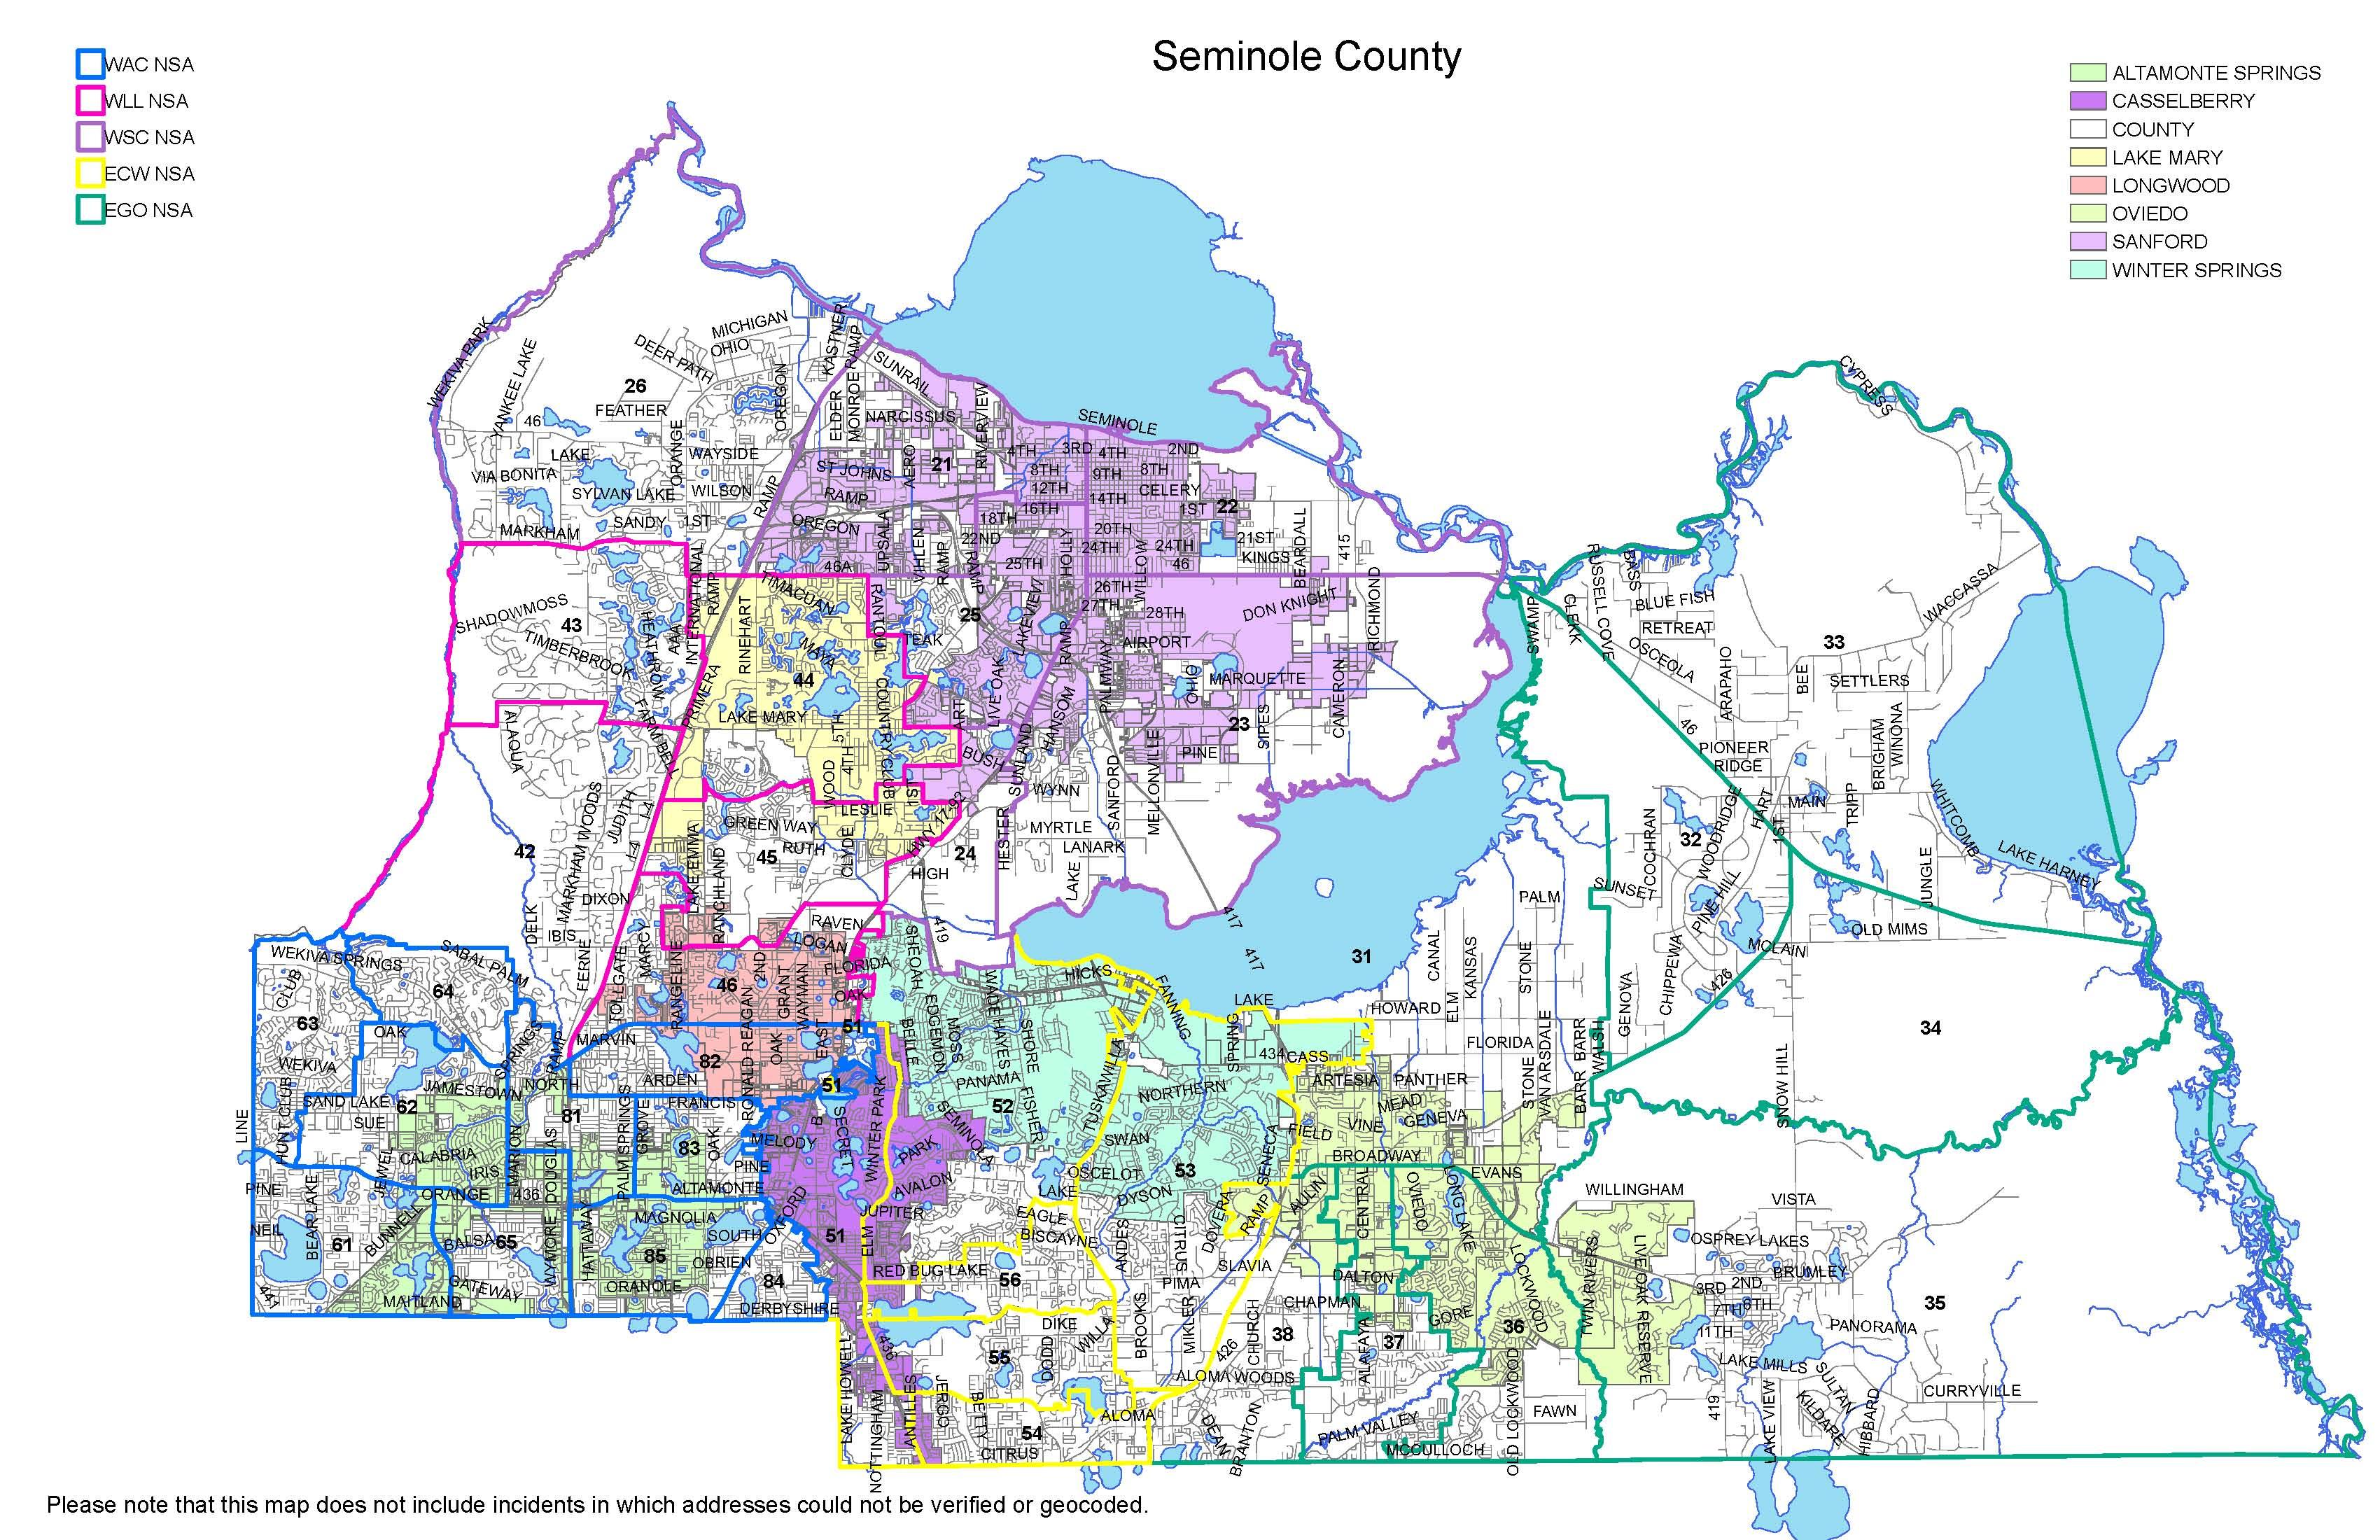 Department - My Neighborhood Policing Division Snp - Seminole Florida Map